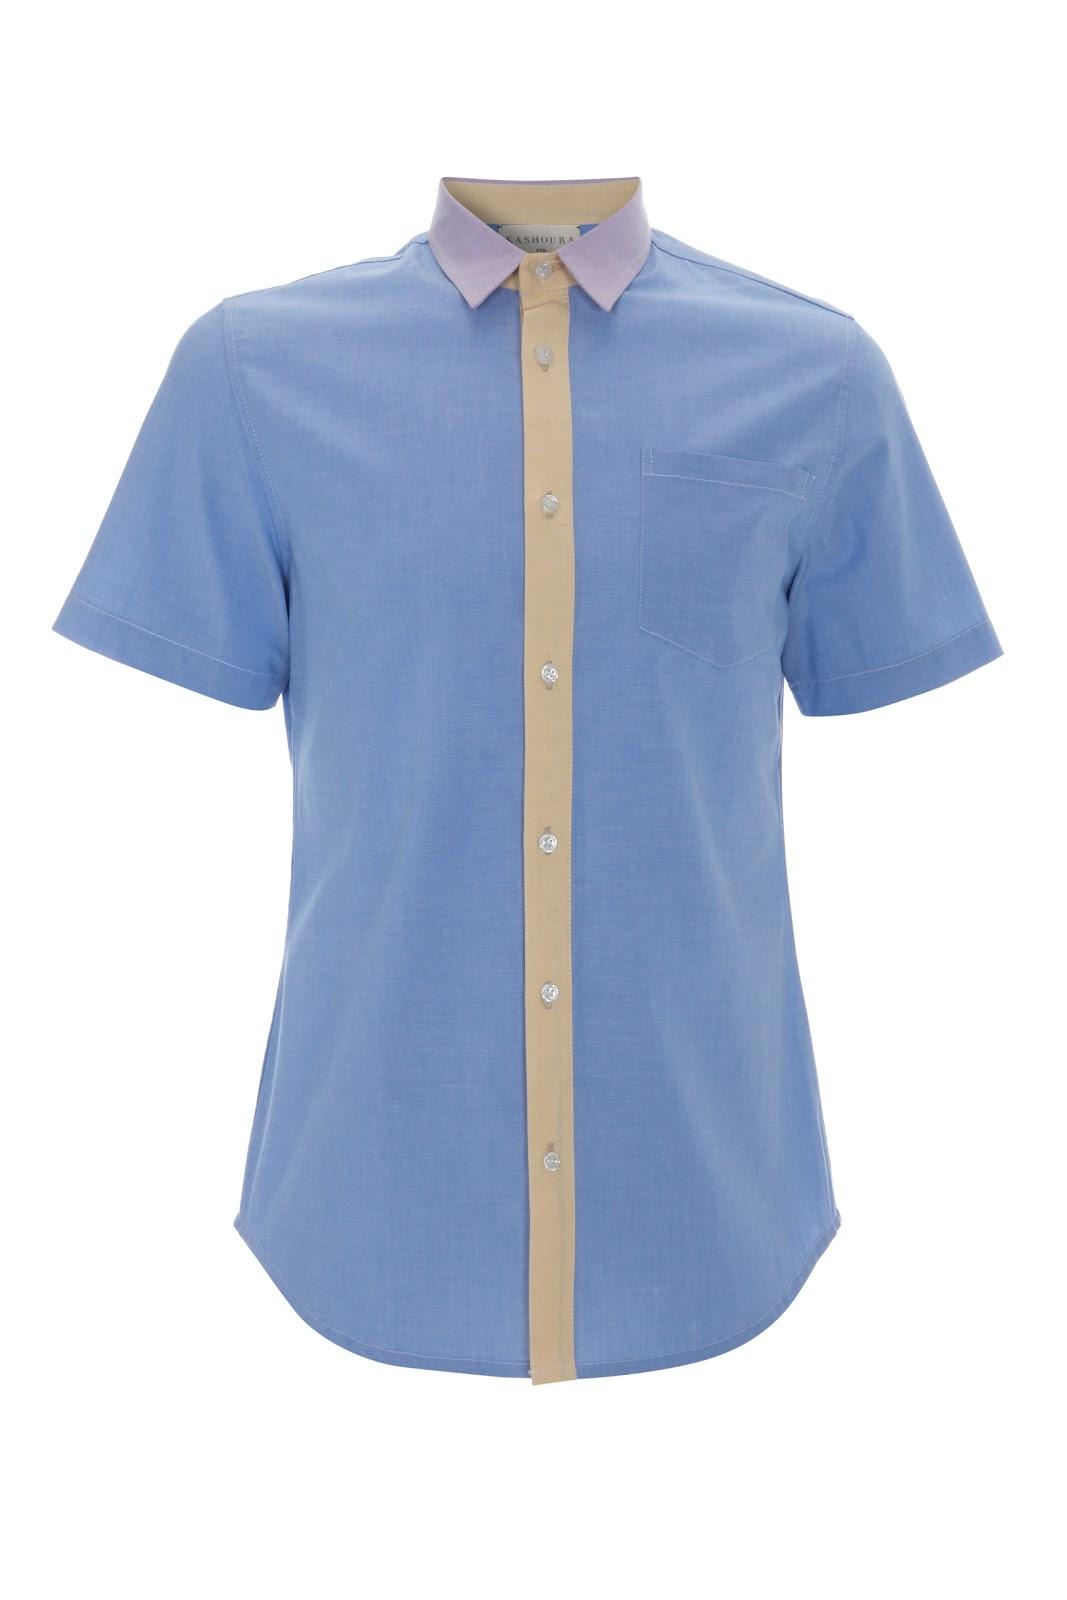 Shirt Designers Uk